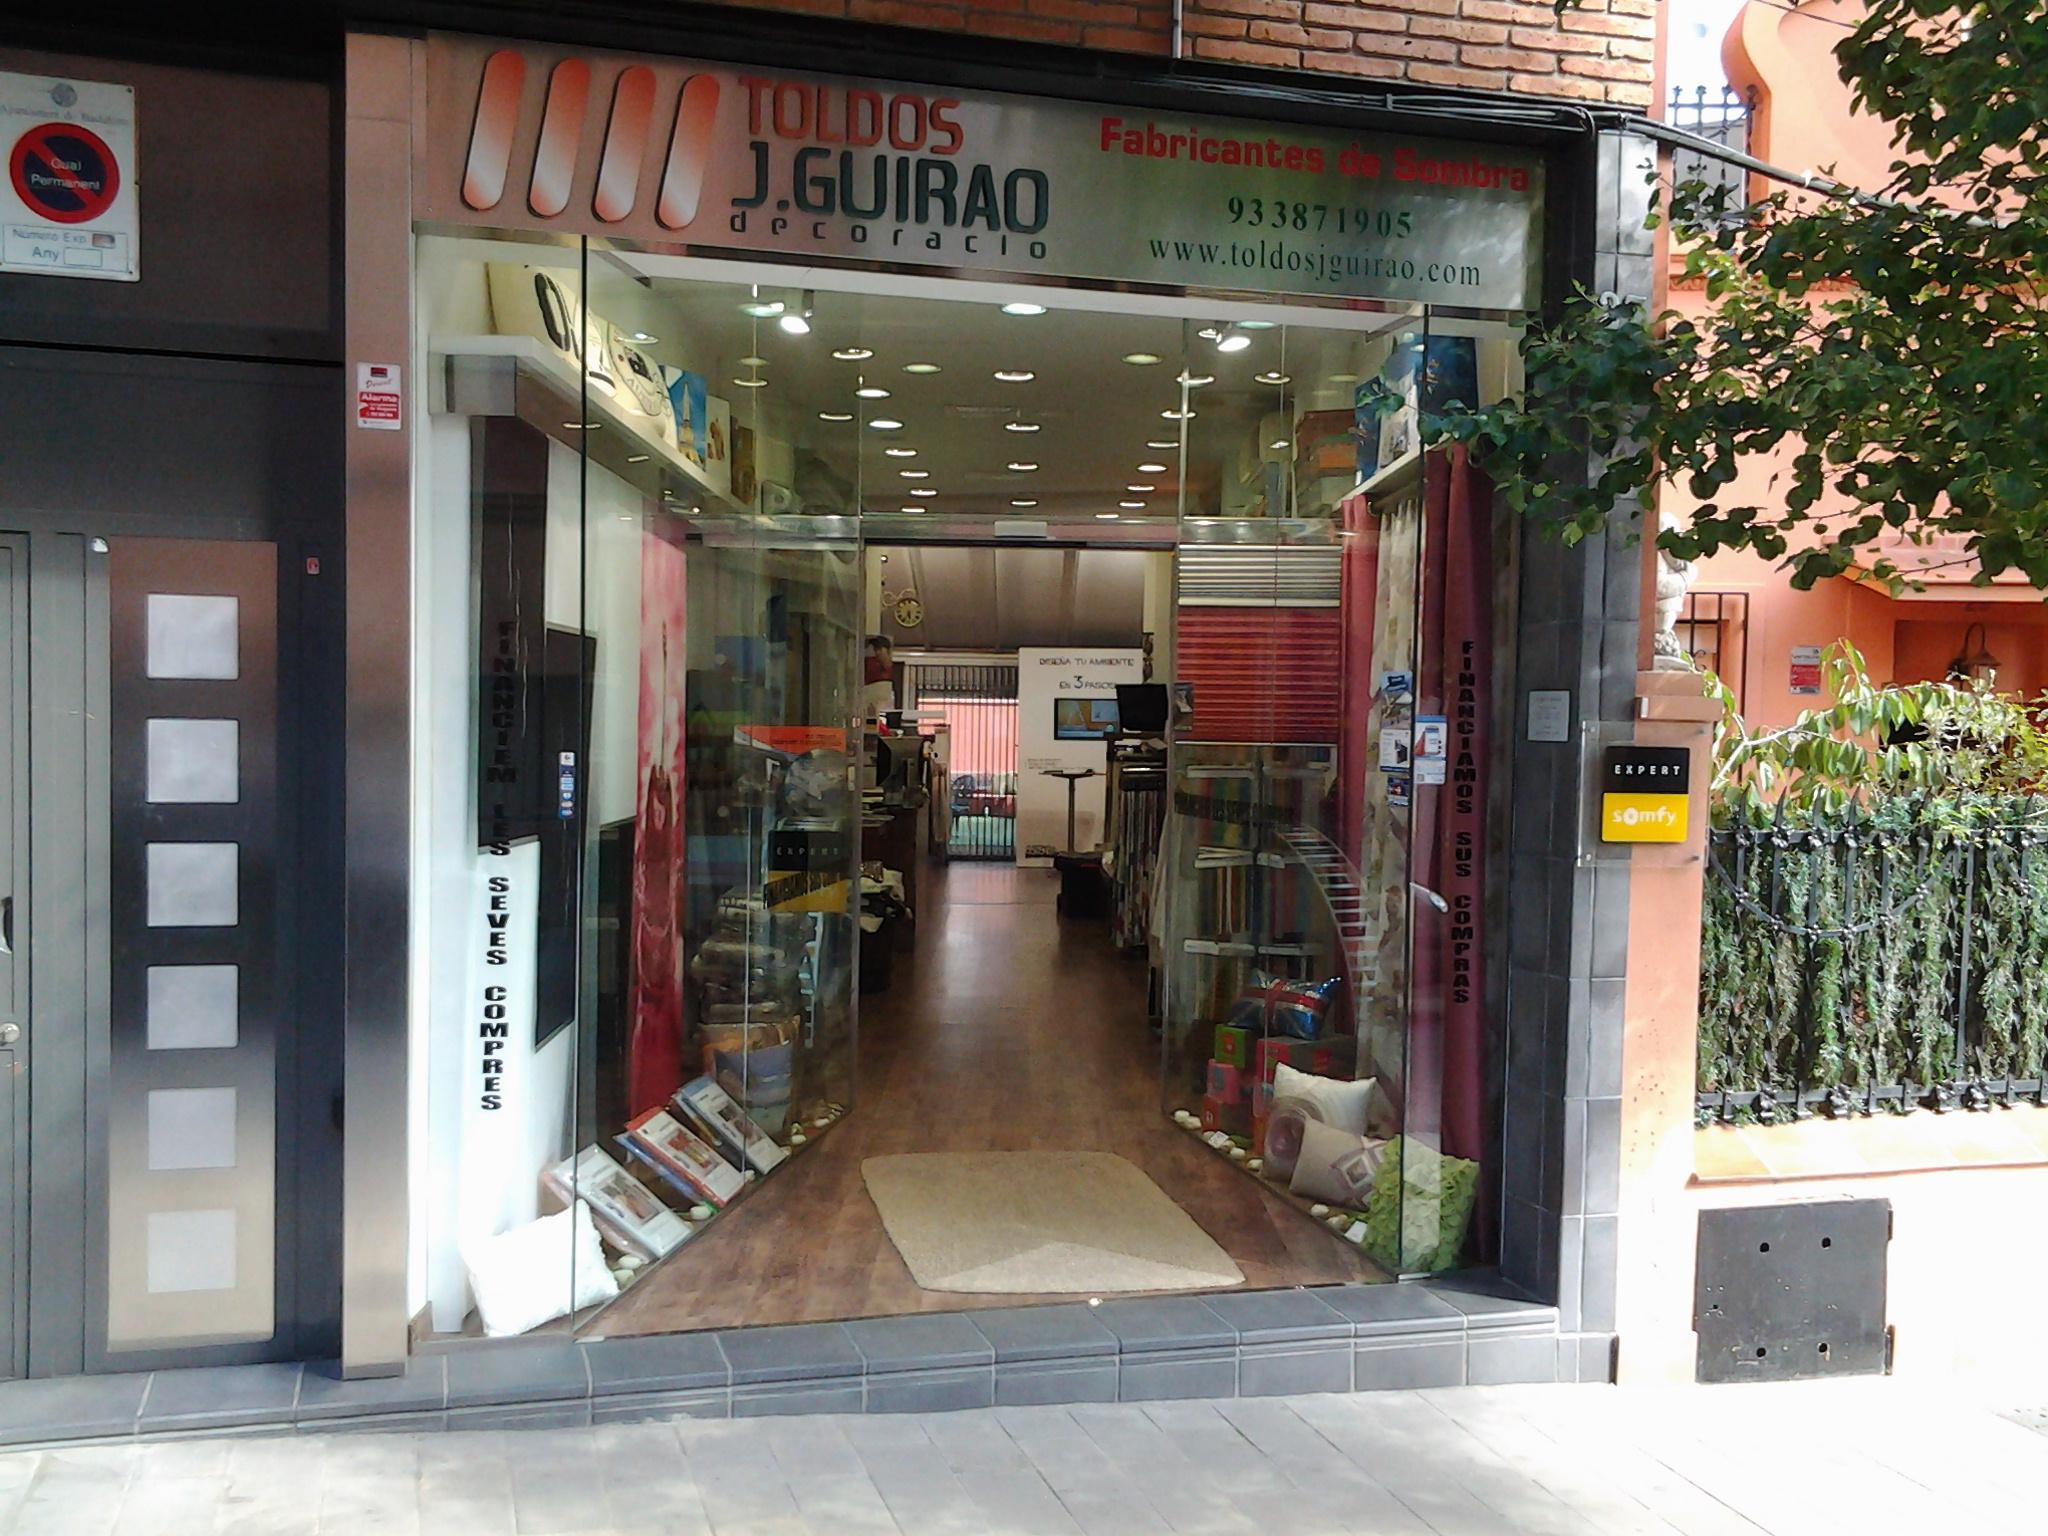 J.Guirao